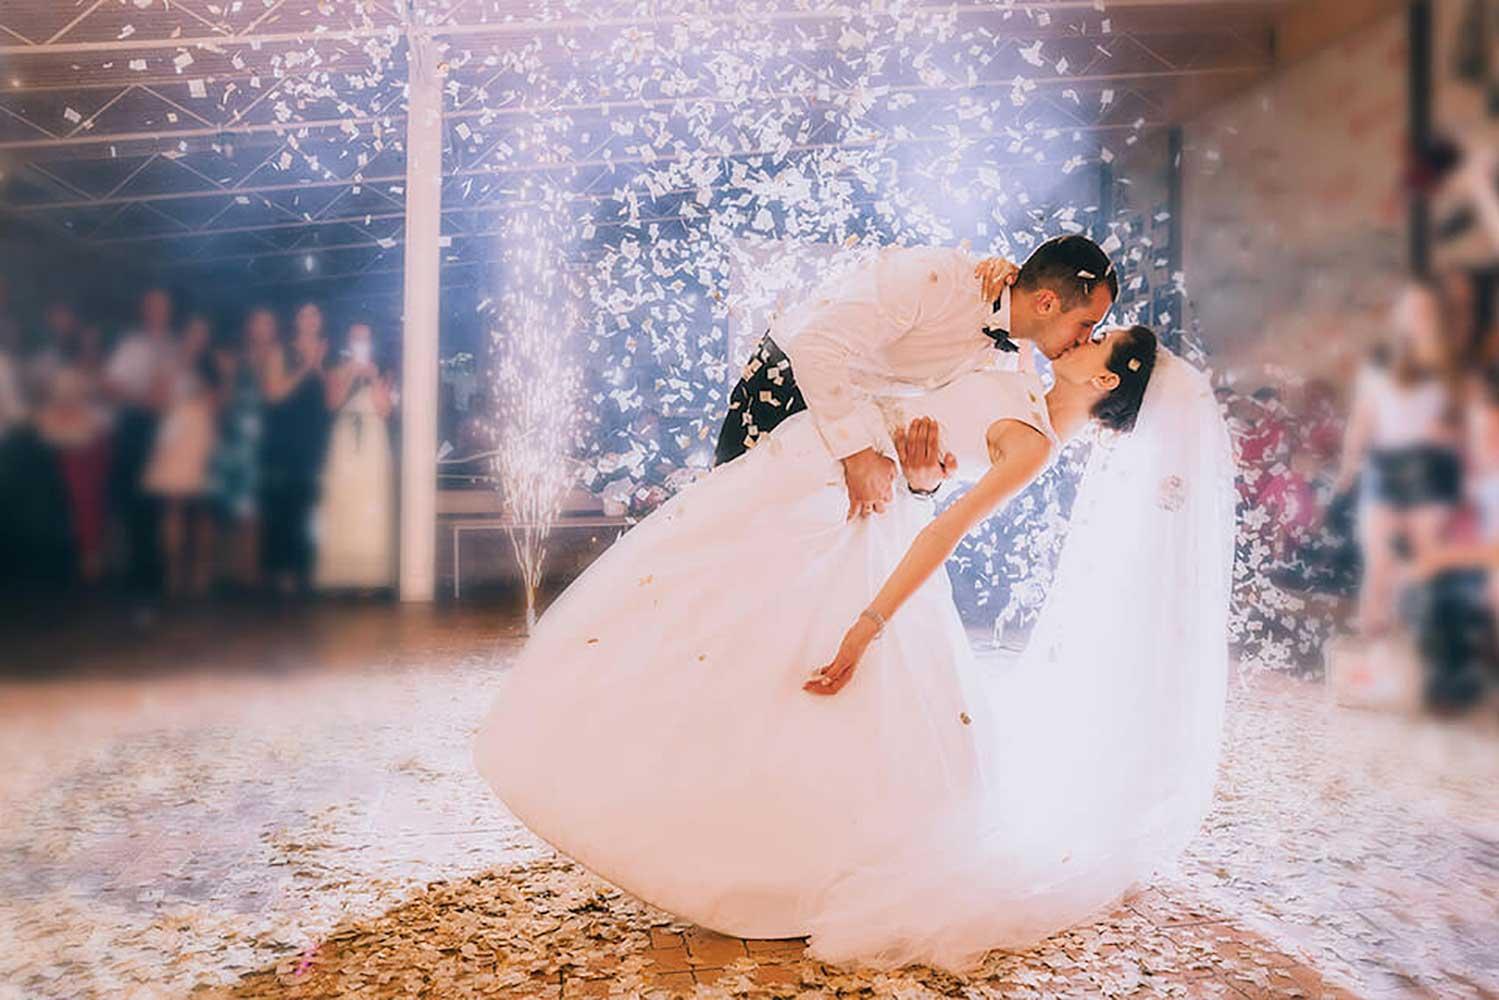 wedding dance classes in Brussels